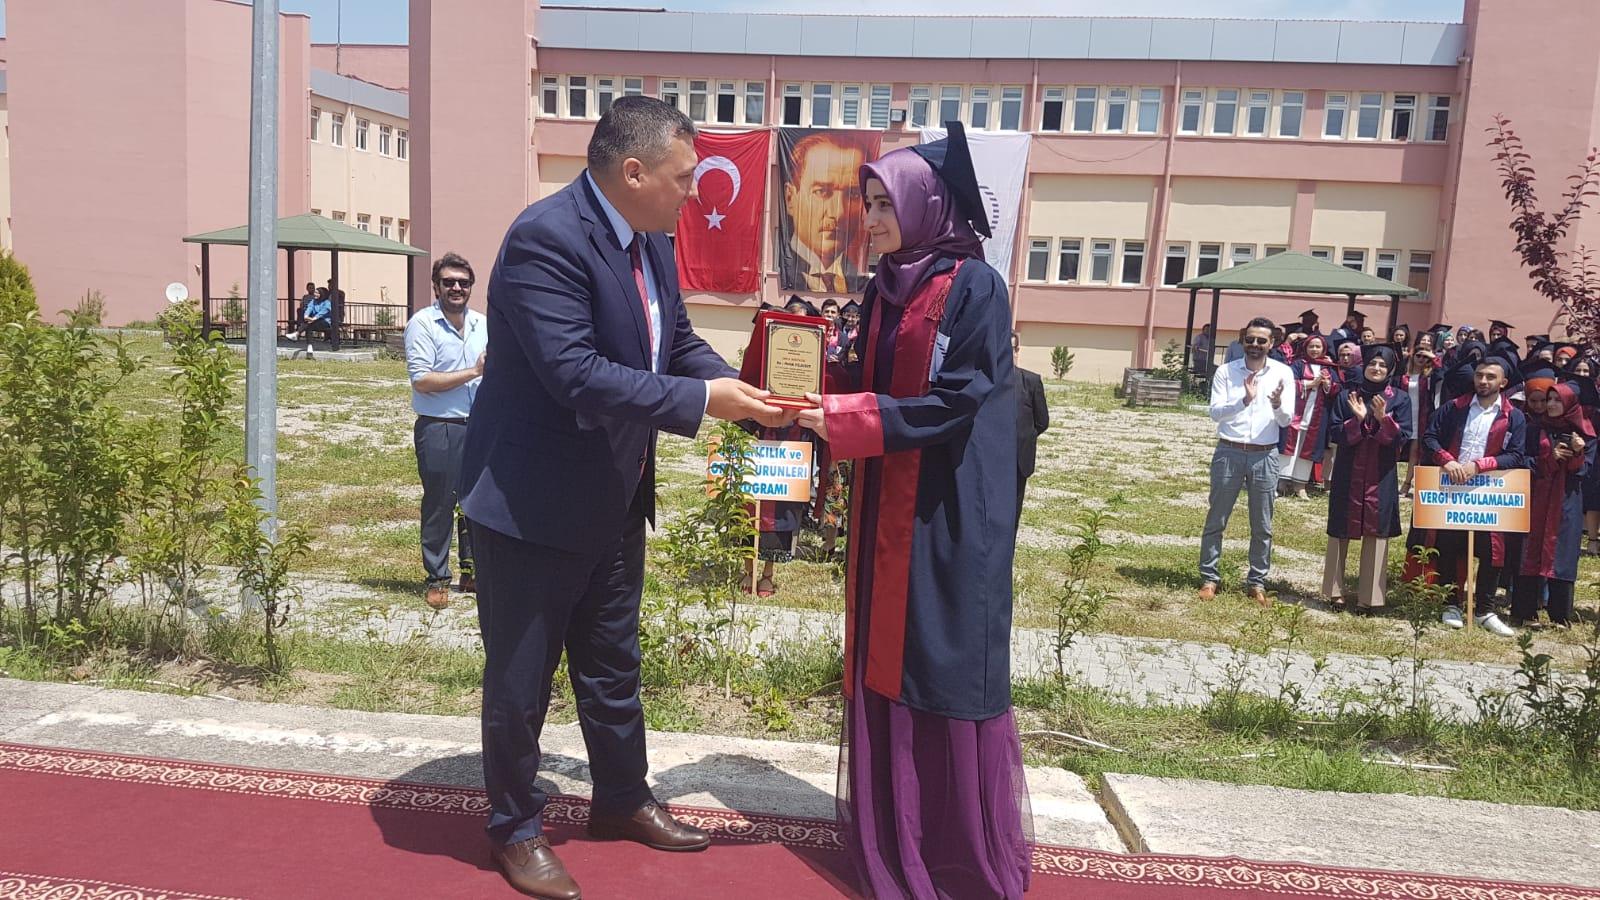 http://www.omu.edu.tr/sites/default/files/files/vezirkopru_myoda_mezuniyet_sevinci/whatsapp_image_2019-05-31_at_17.55.51.jpeg